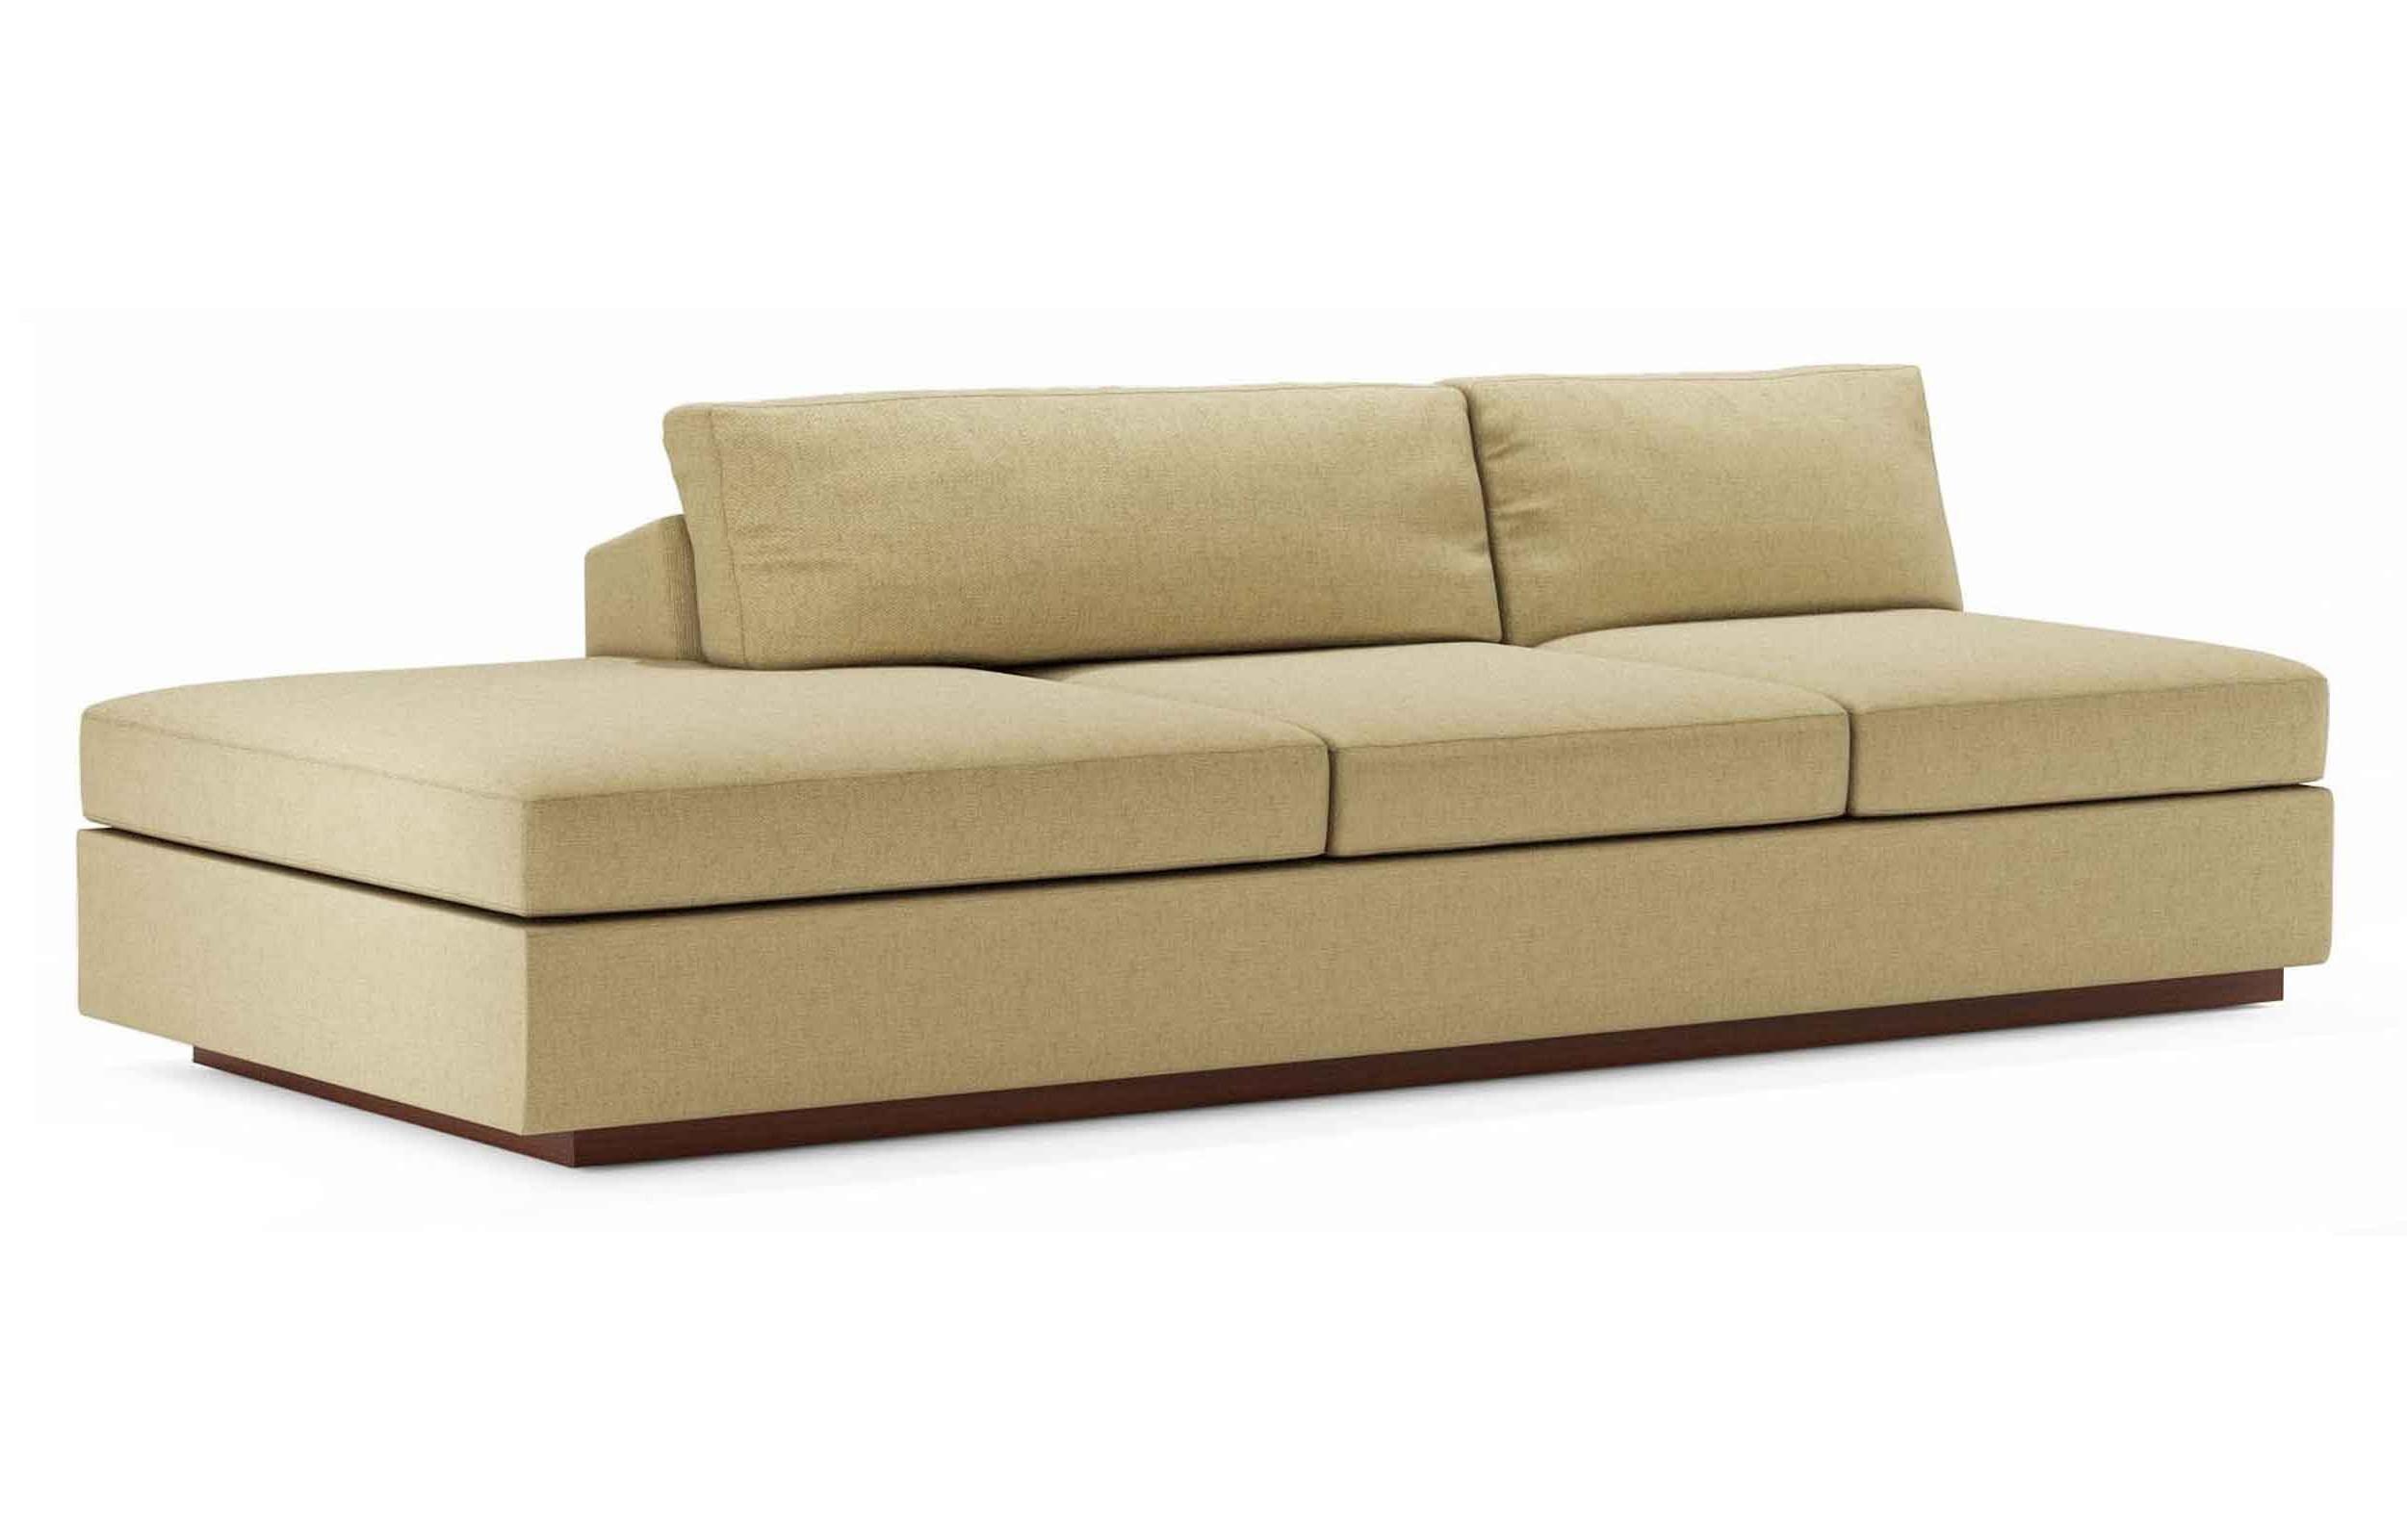 armless sofas design sofa petrol wash 10 top small ideas